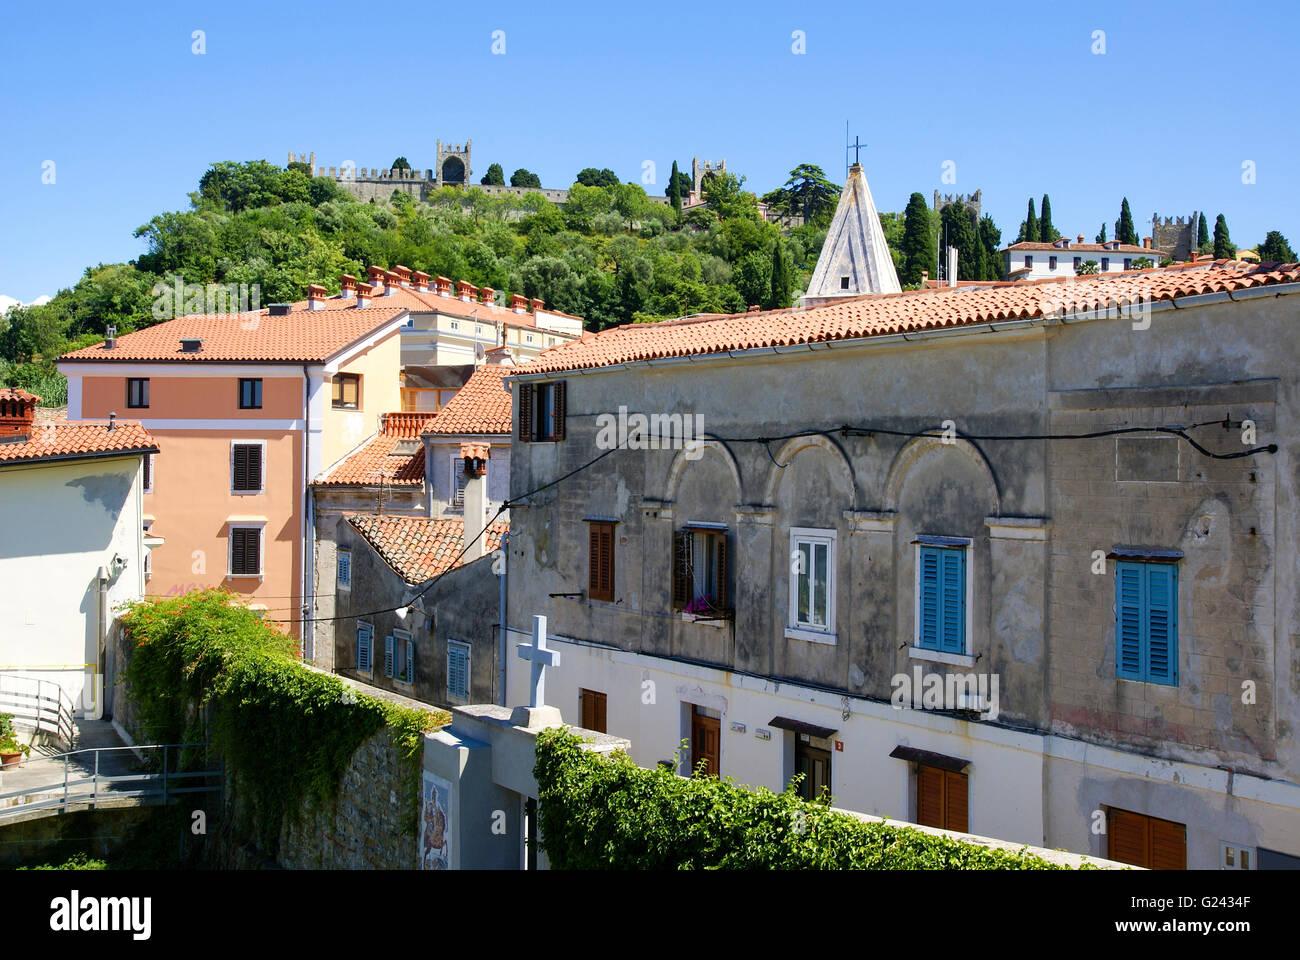 Piran (Pirano) is a town in southwestern Slovenia on the Gulf of Piran on the Adriatic Sea - Stock Image